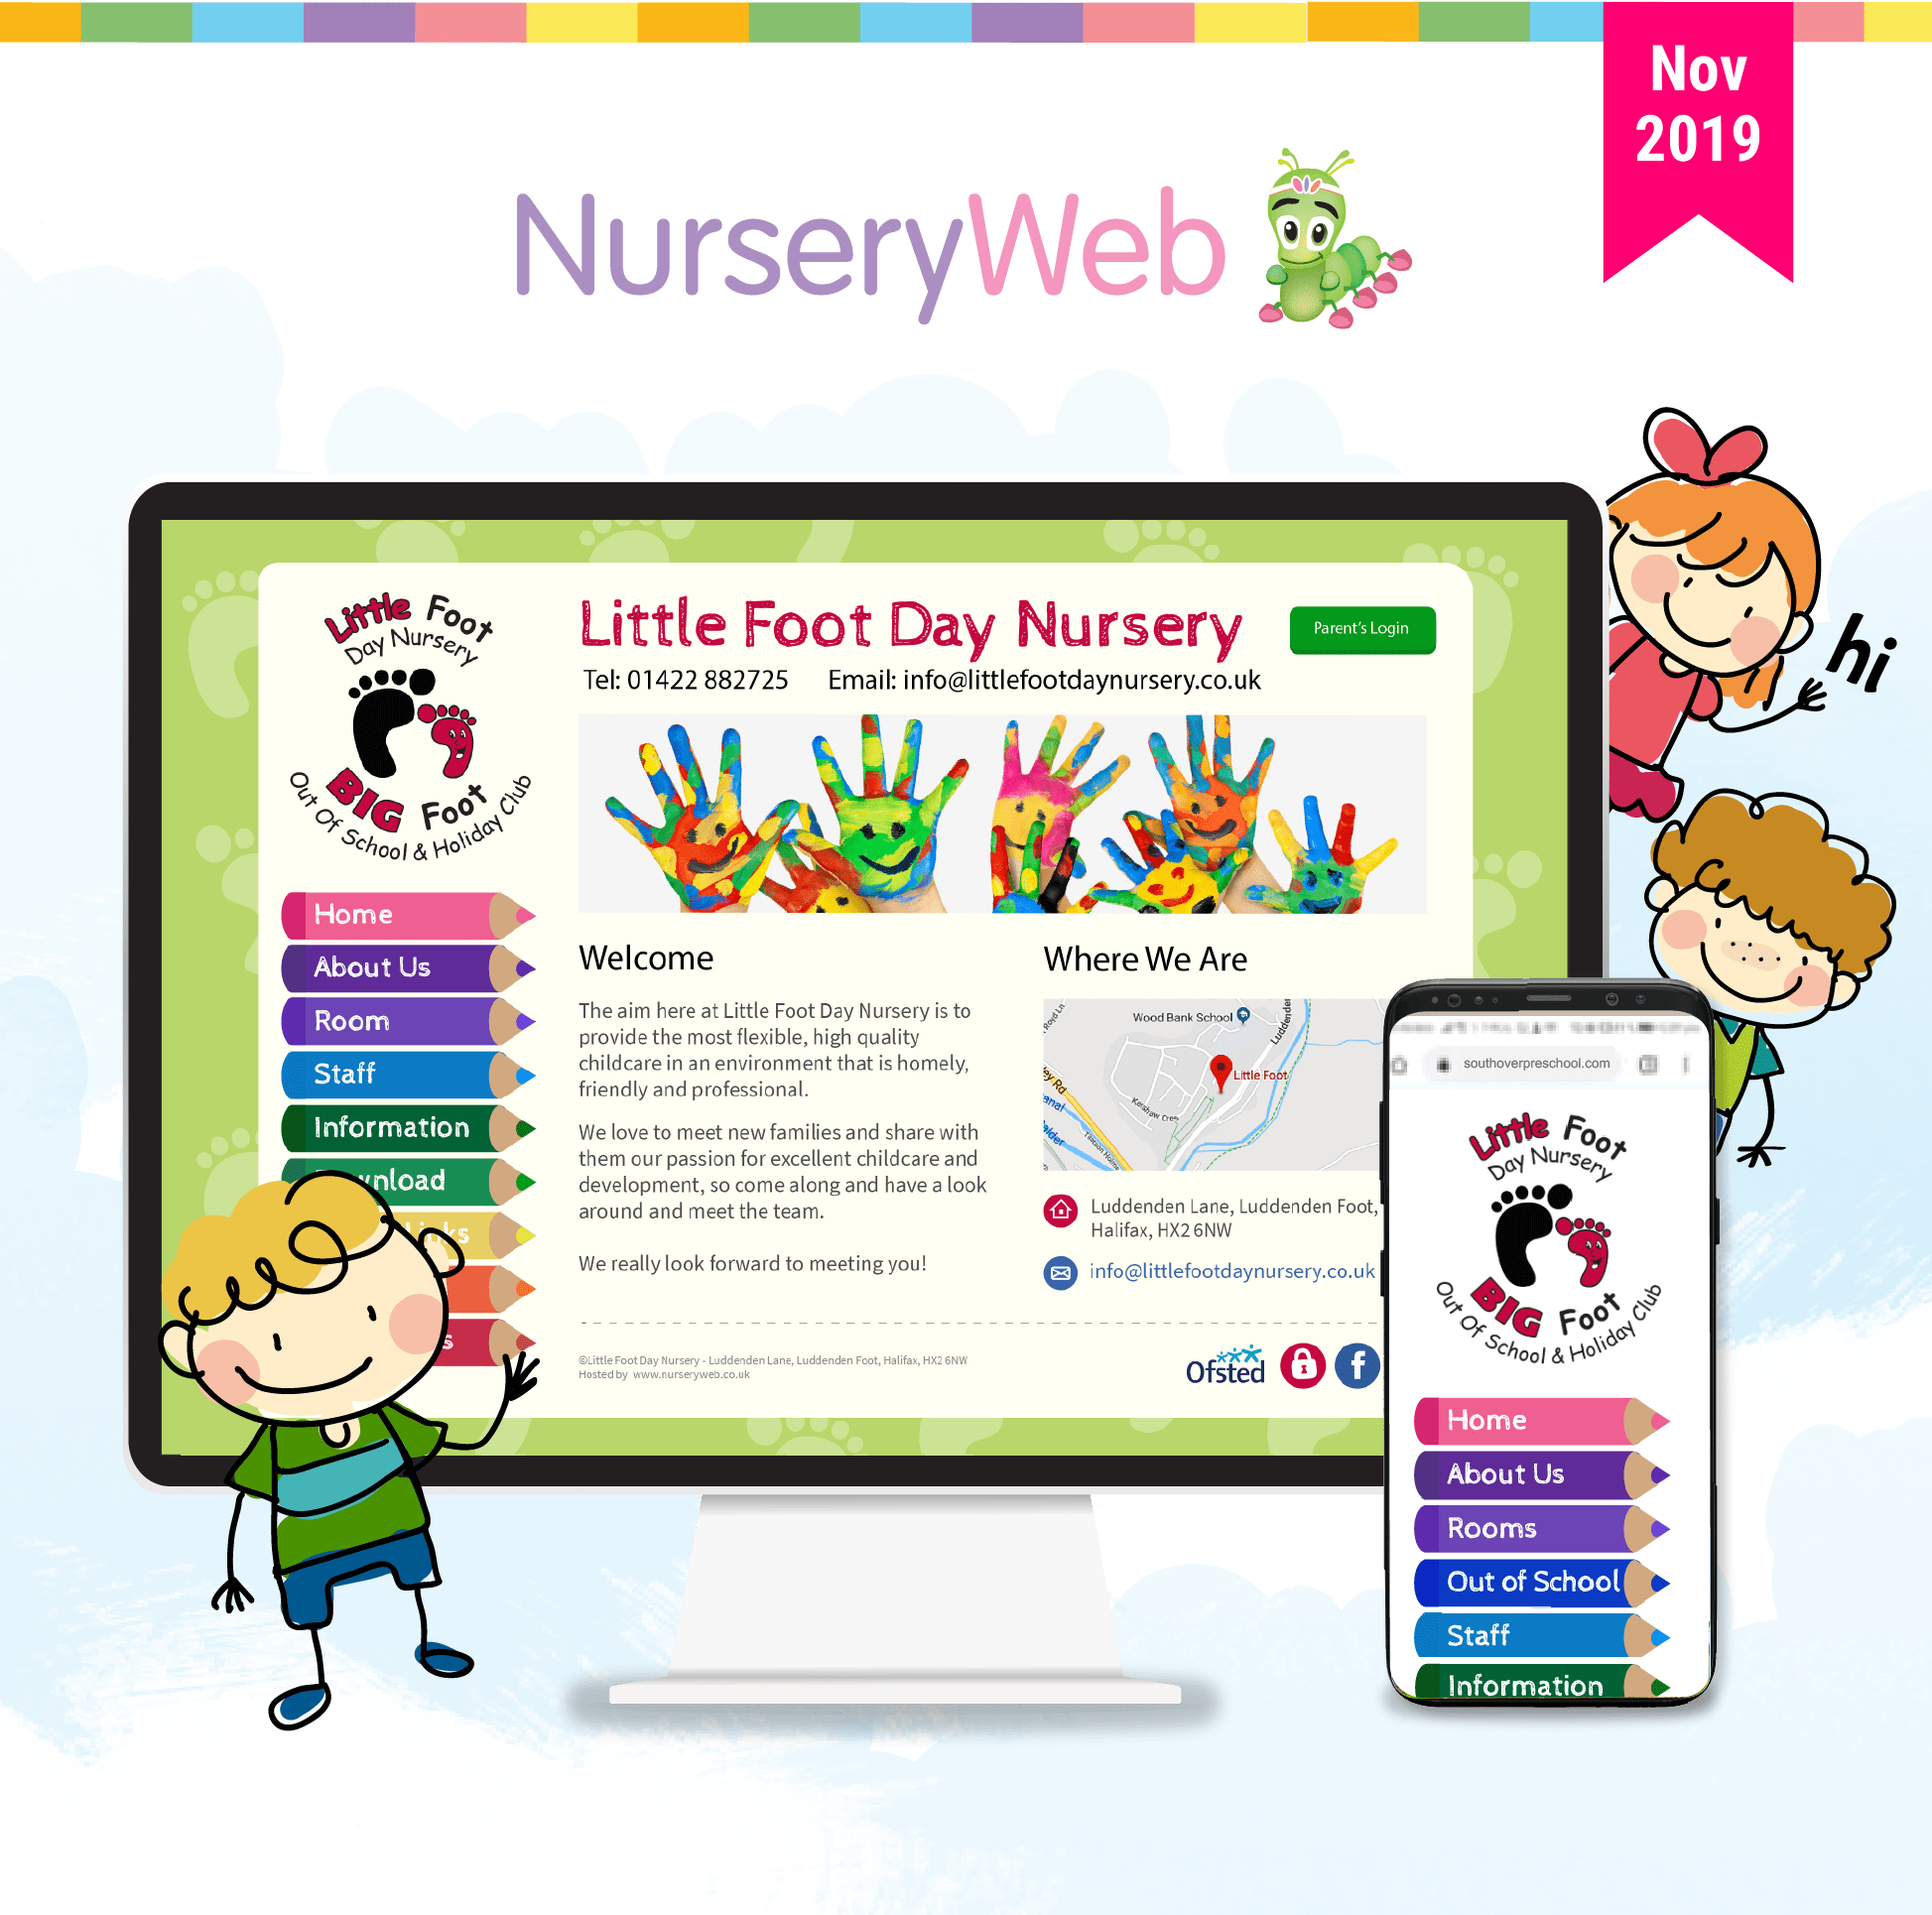 NurseryWeb - November 2019 Newsletter